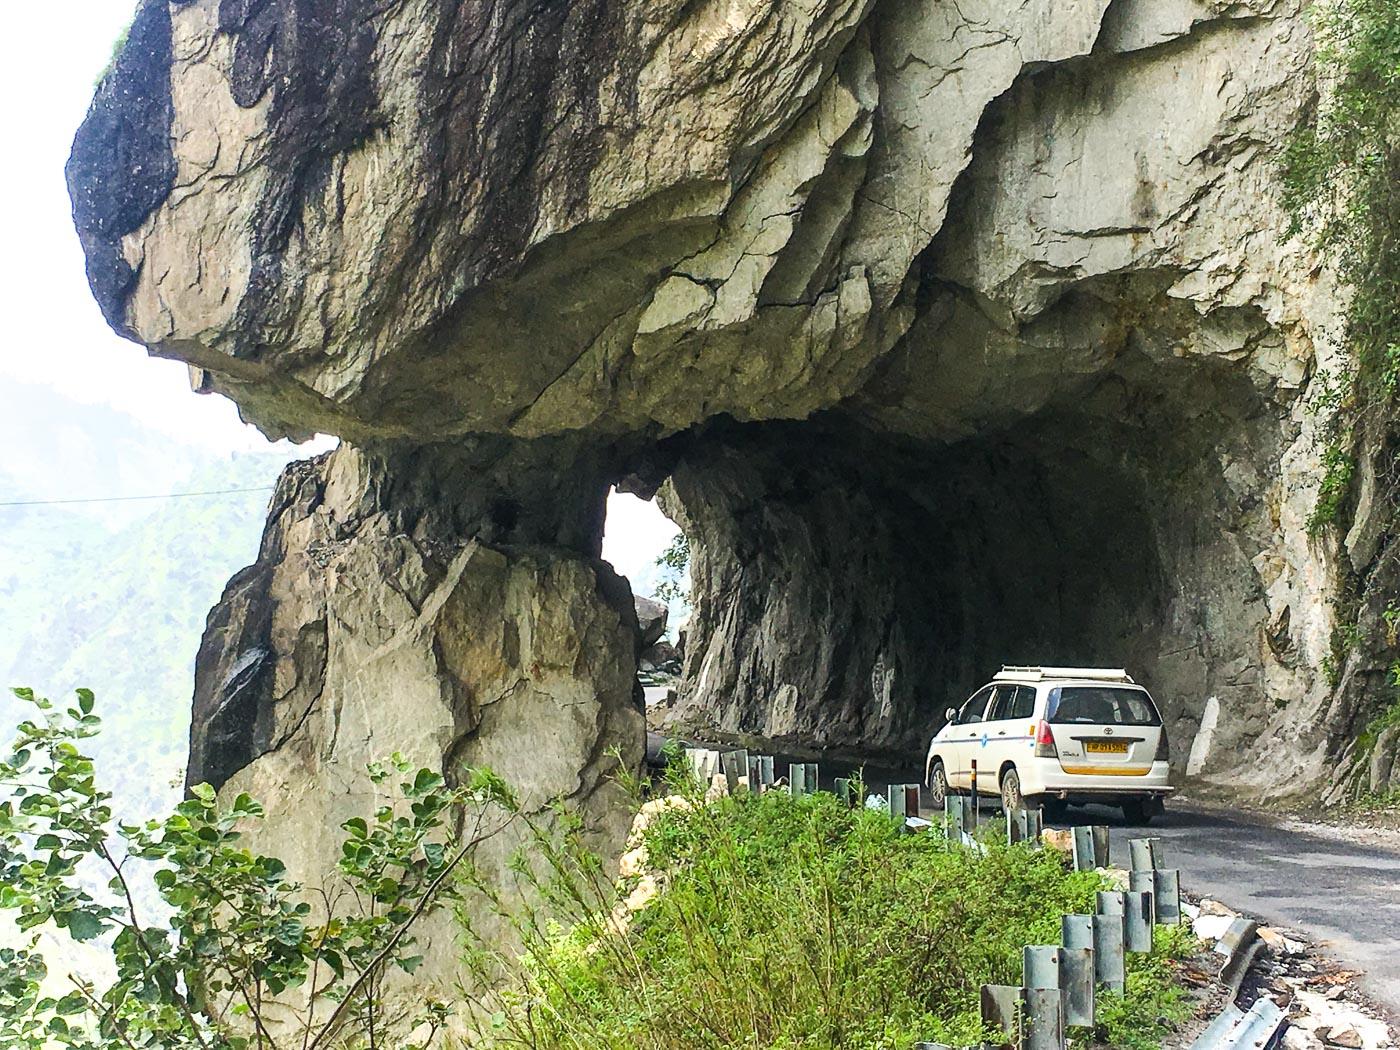 Spiti_Valley_Himachal_Pradesh_India_Kinnaur_Kullu_Manali_Road_trip_mountains_winter_Buddhist_Monastry_Sassy_Pilgrim_Travel_Blog_female_Blogger_Professional_Solo_Tips